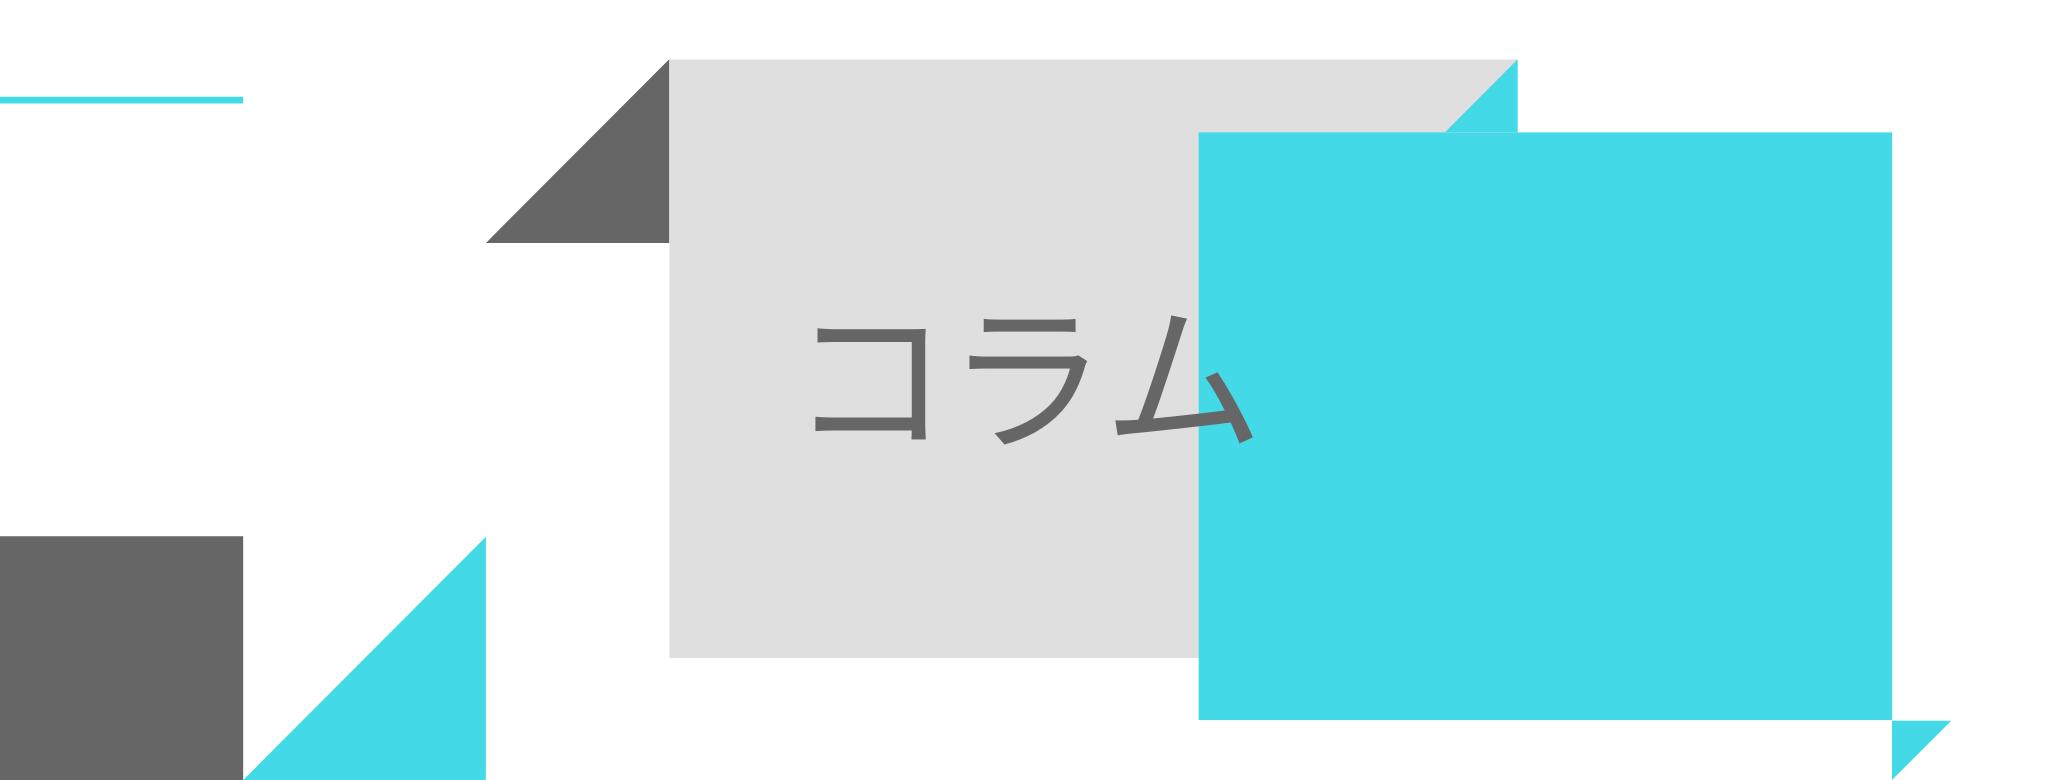 VtigerCRMのオープンソース版の日本語言語ファイル(V7.3用)が完成